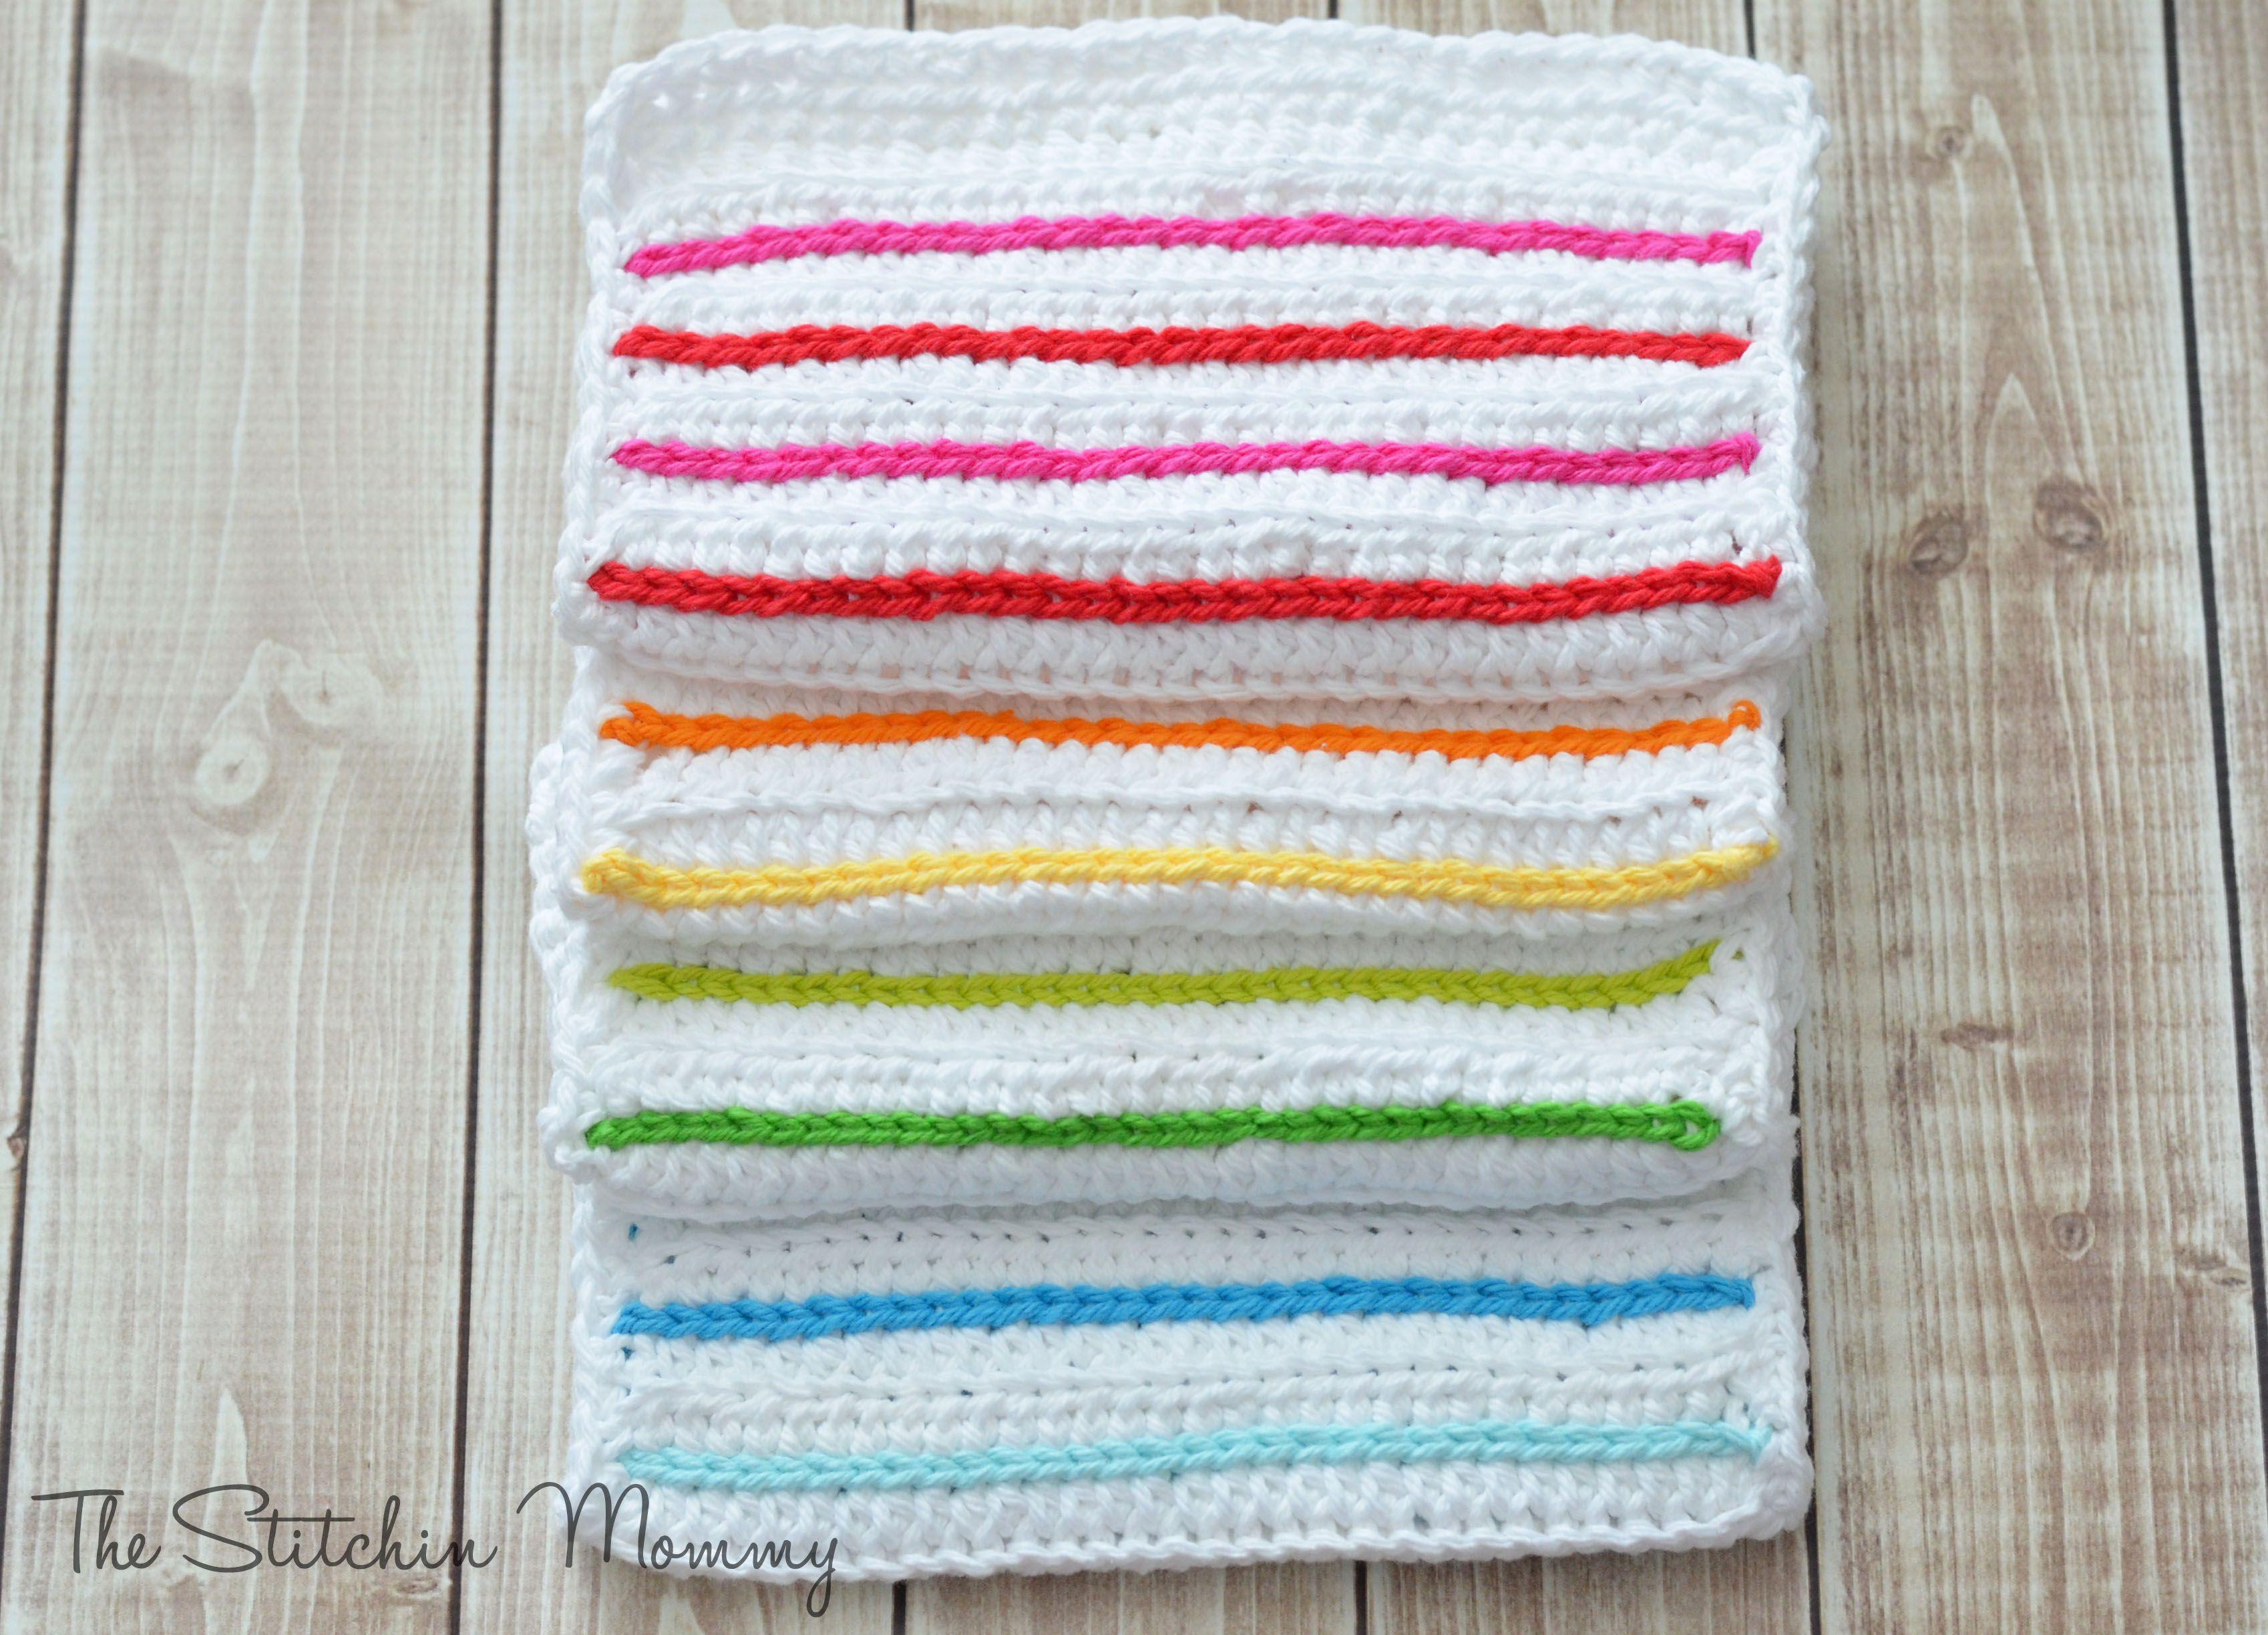 Crochet striped dishcloths dishcloth crochet and dishcloth crochet crochet striped dishcloths bankloansurffo Choice Image